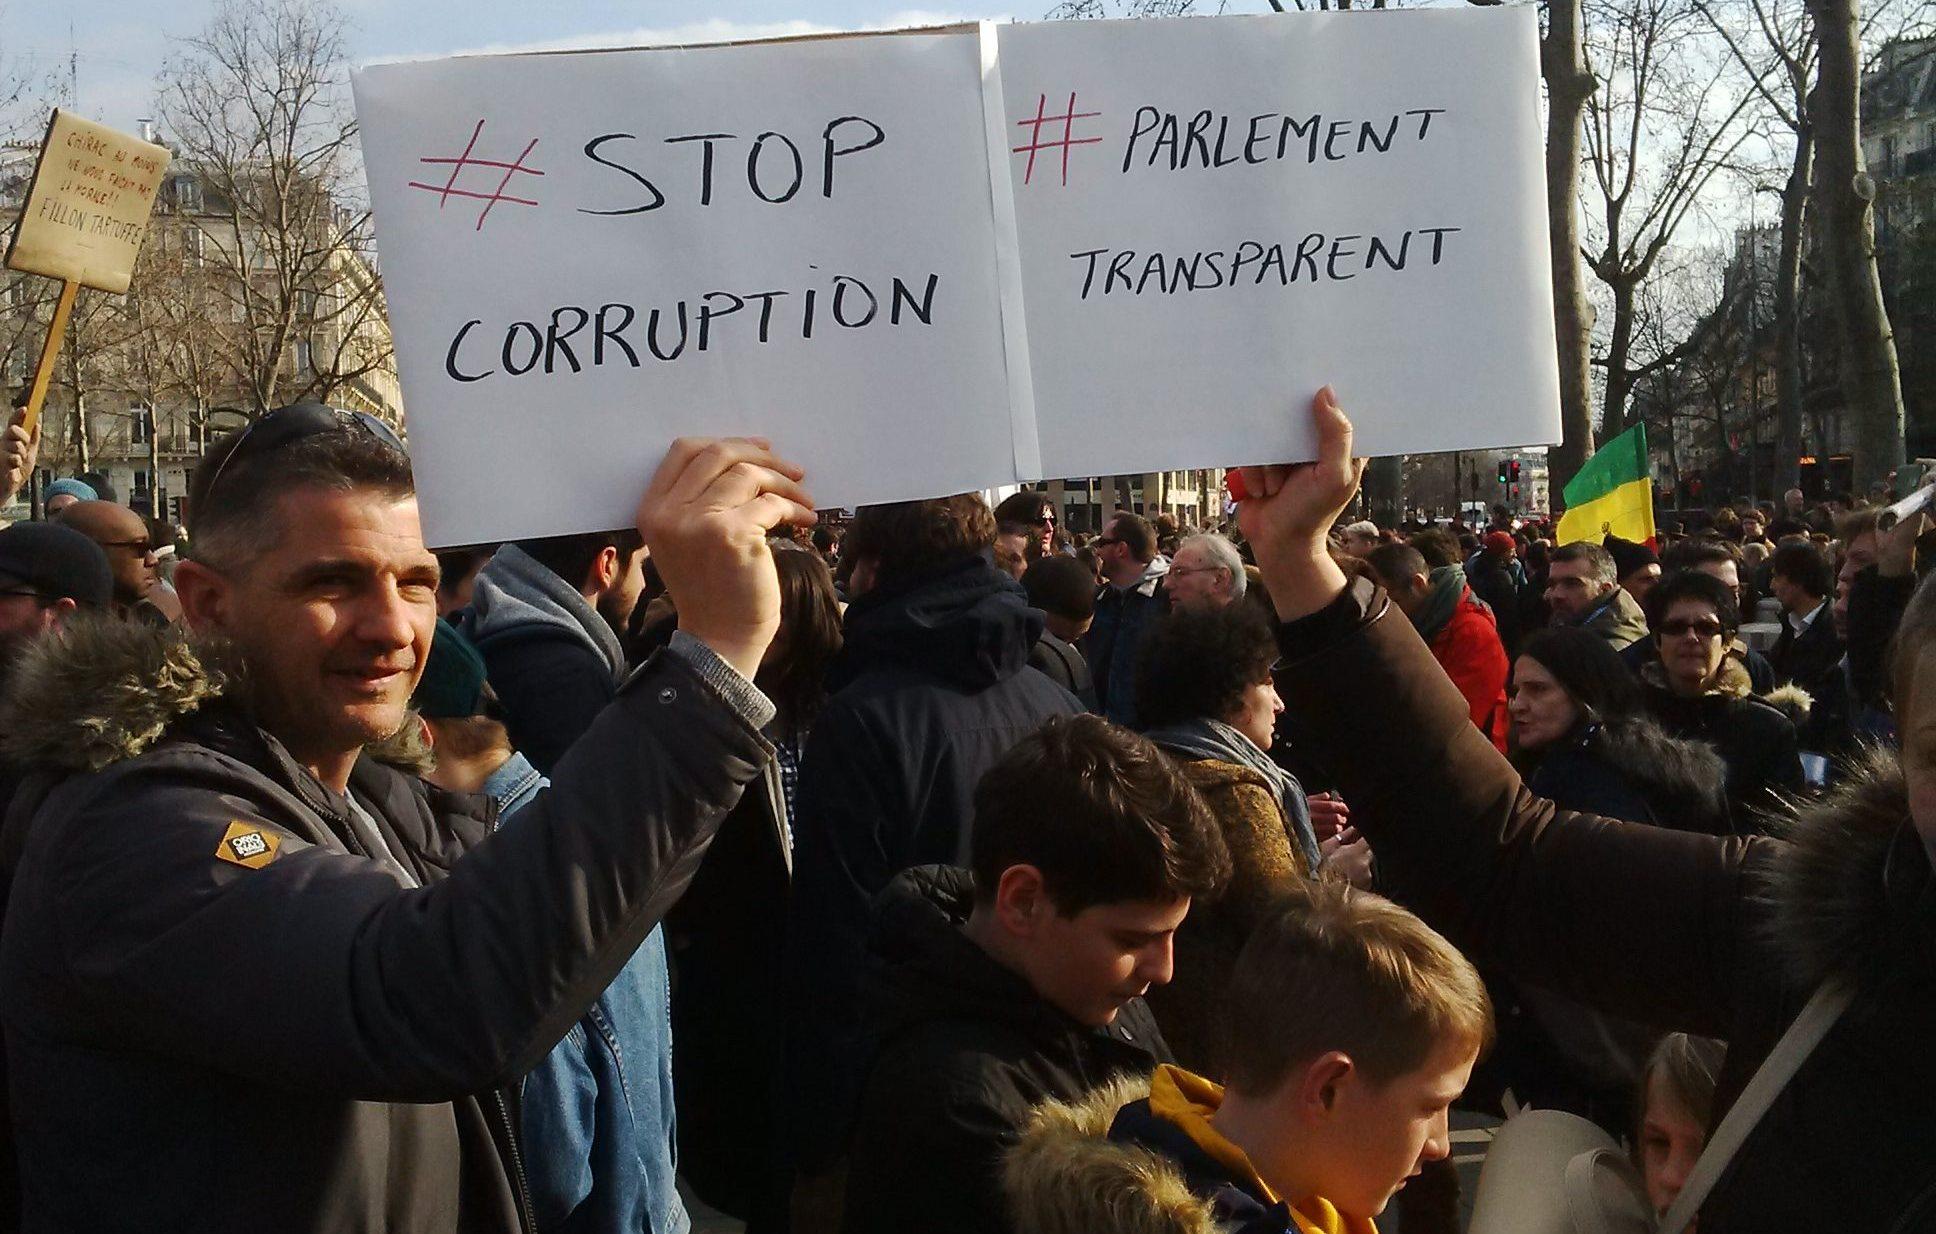 #StopCorruption